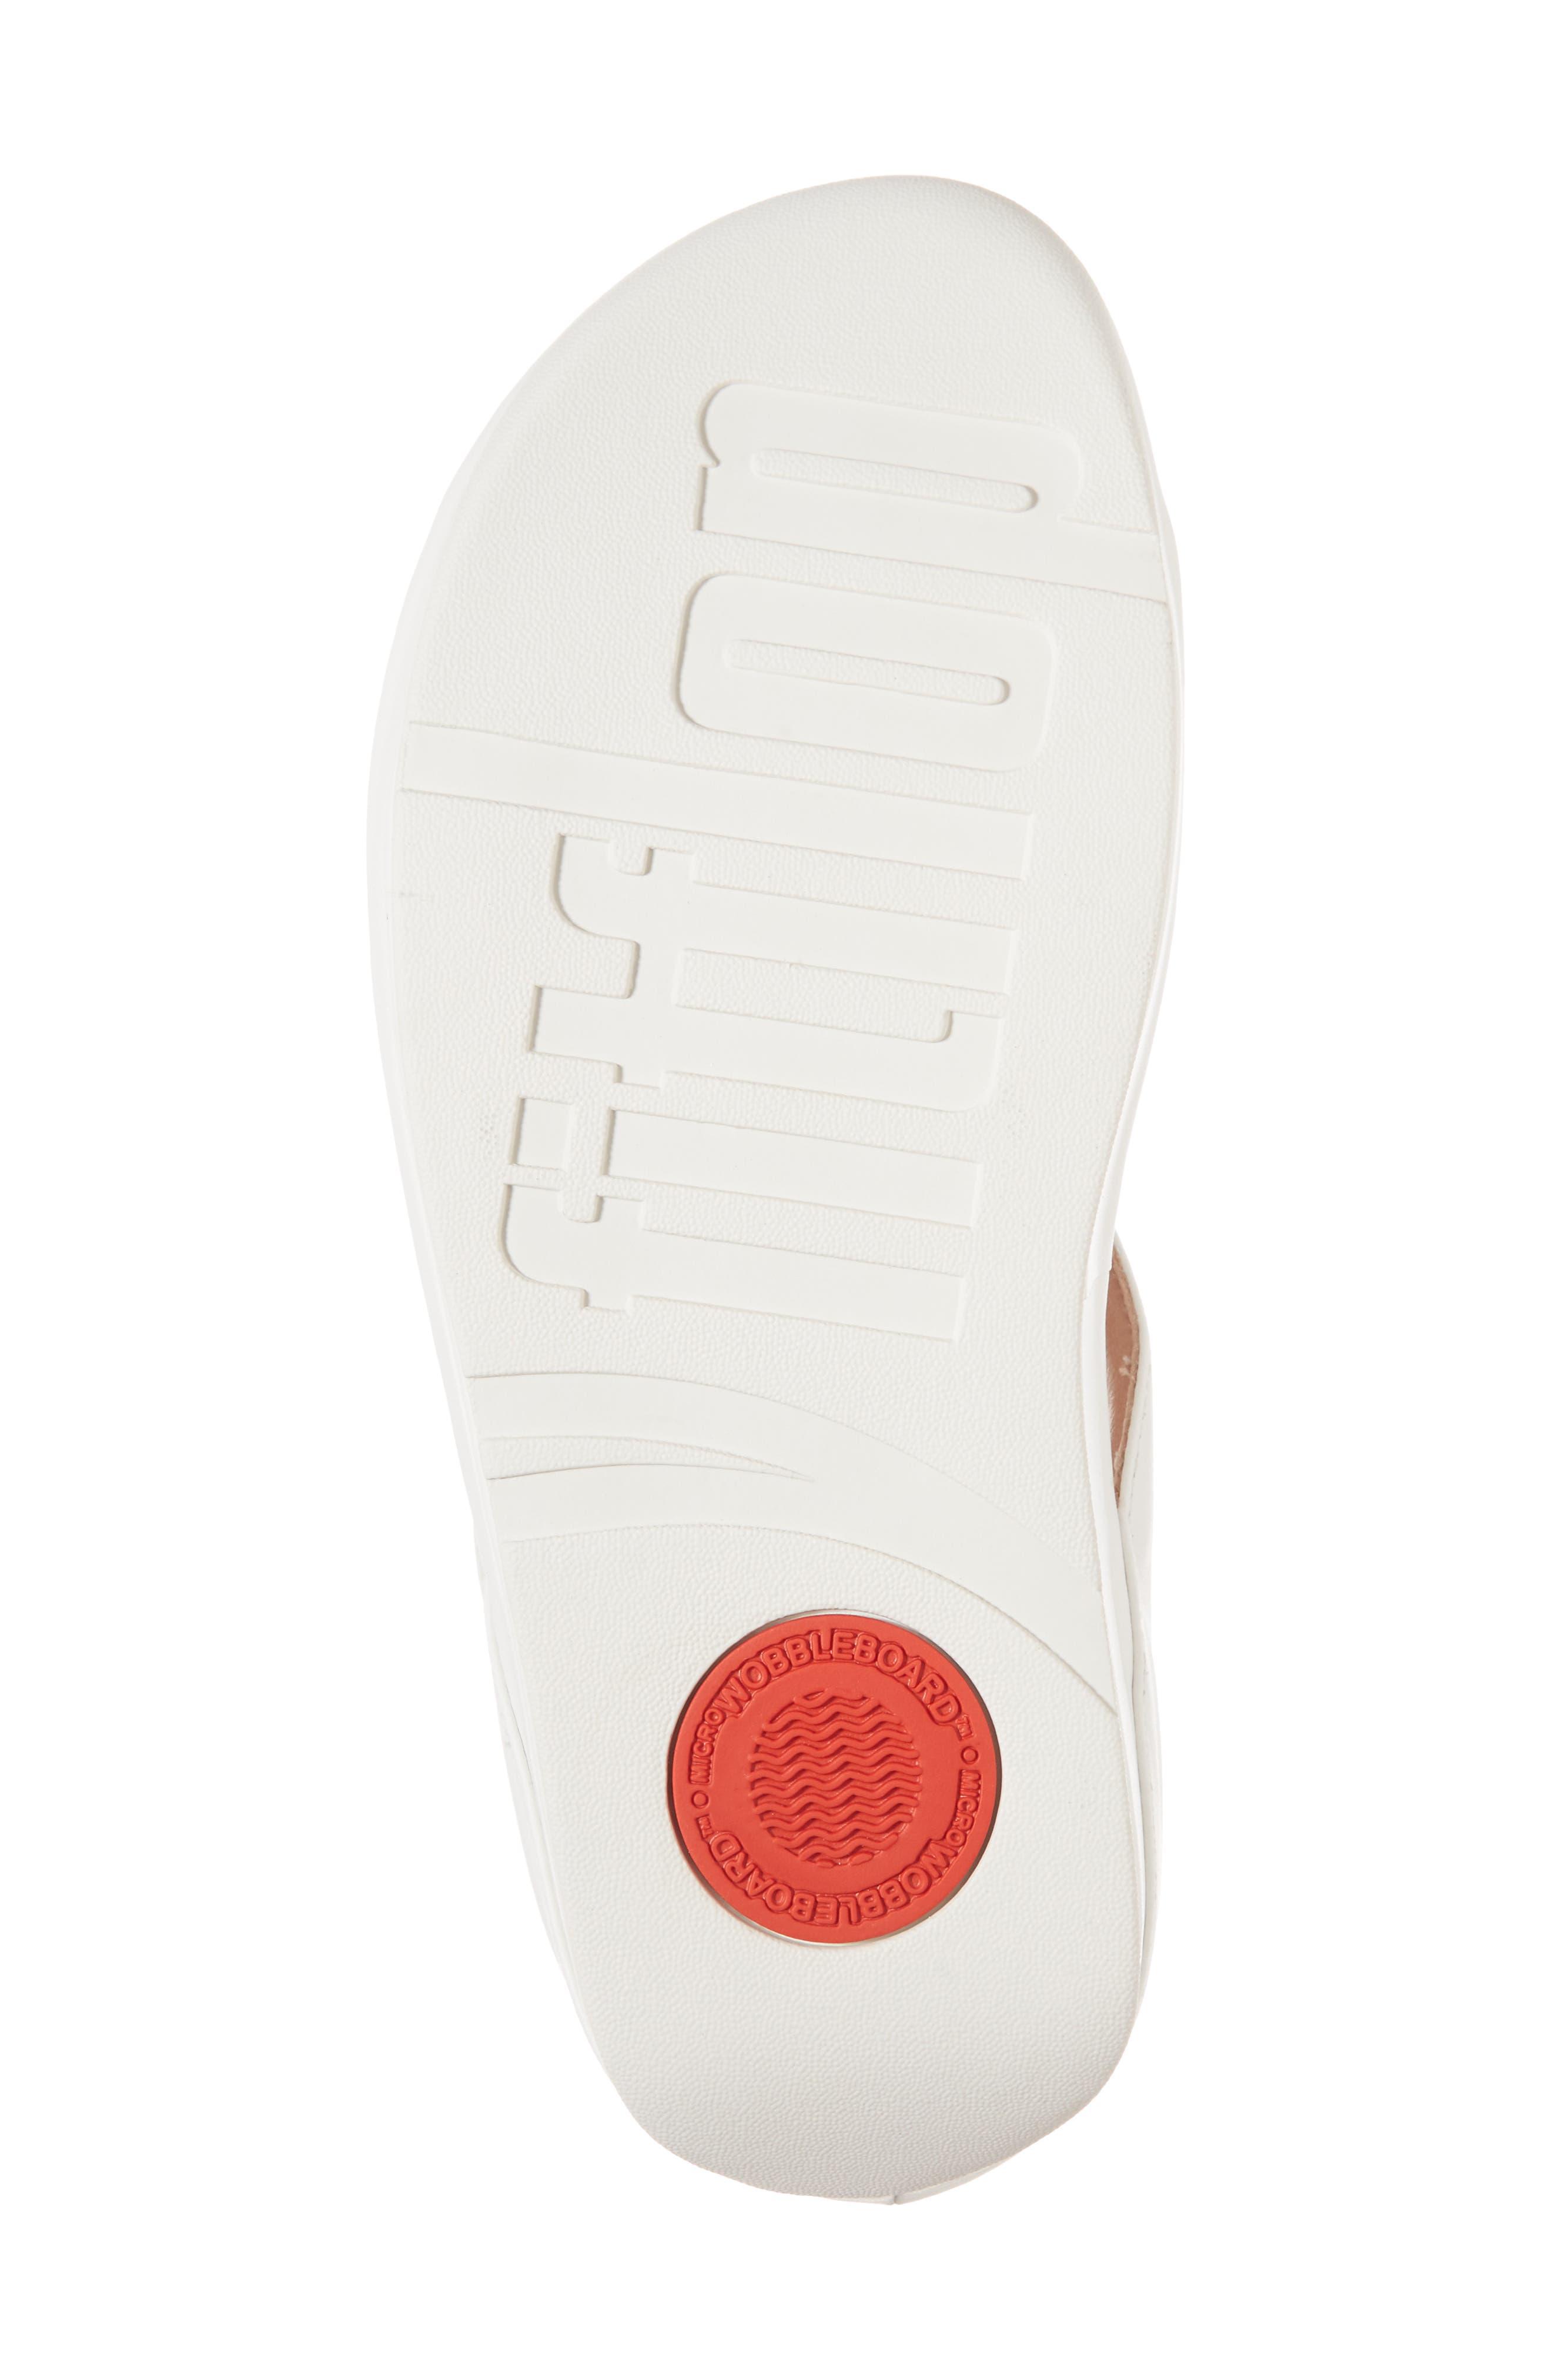 Rumba Sandal,                             Alternate thumbnail 6, color,                             Urban White Leather